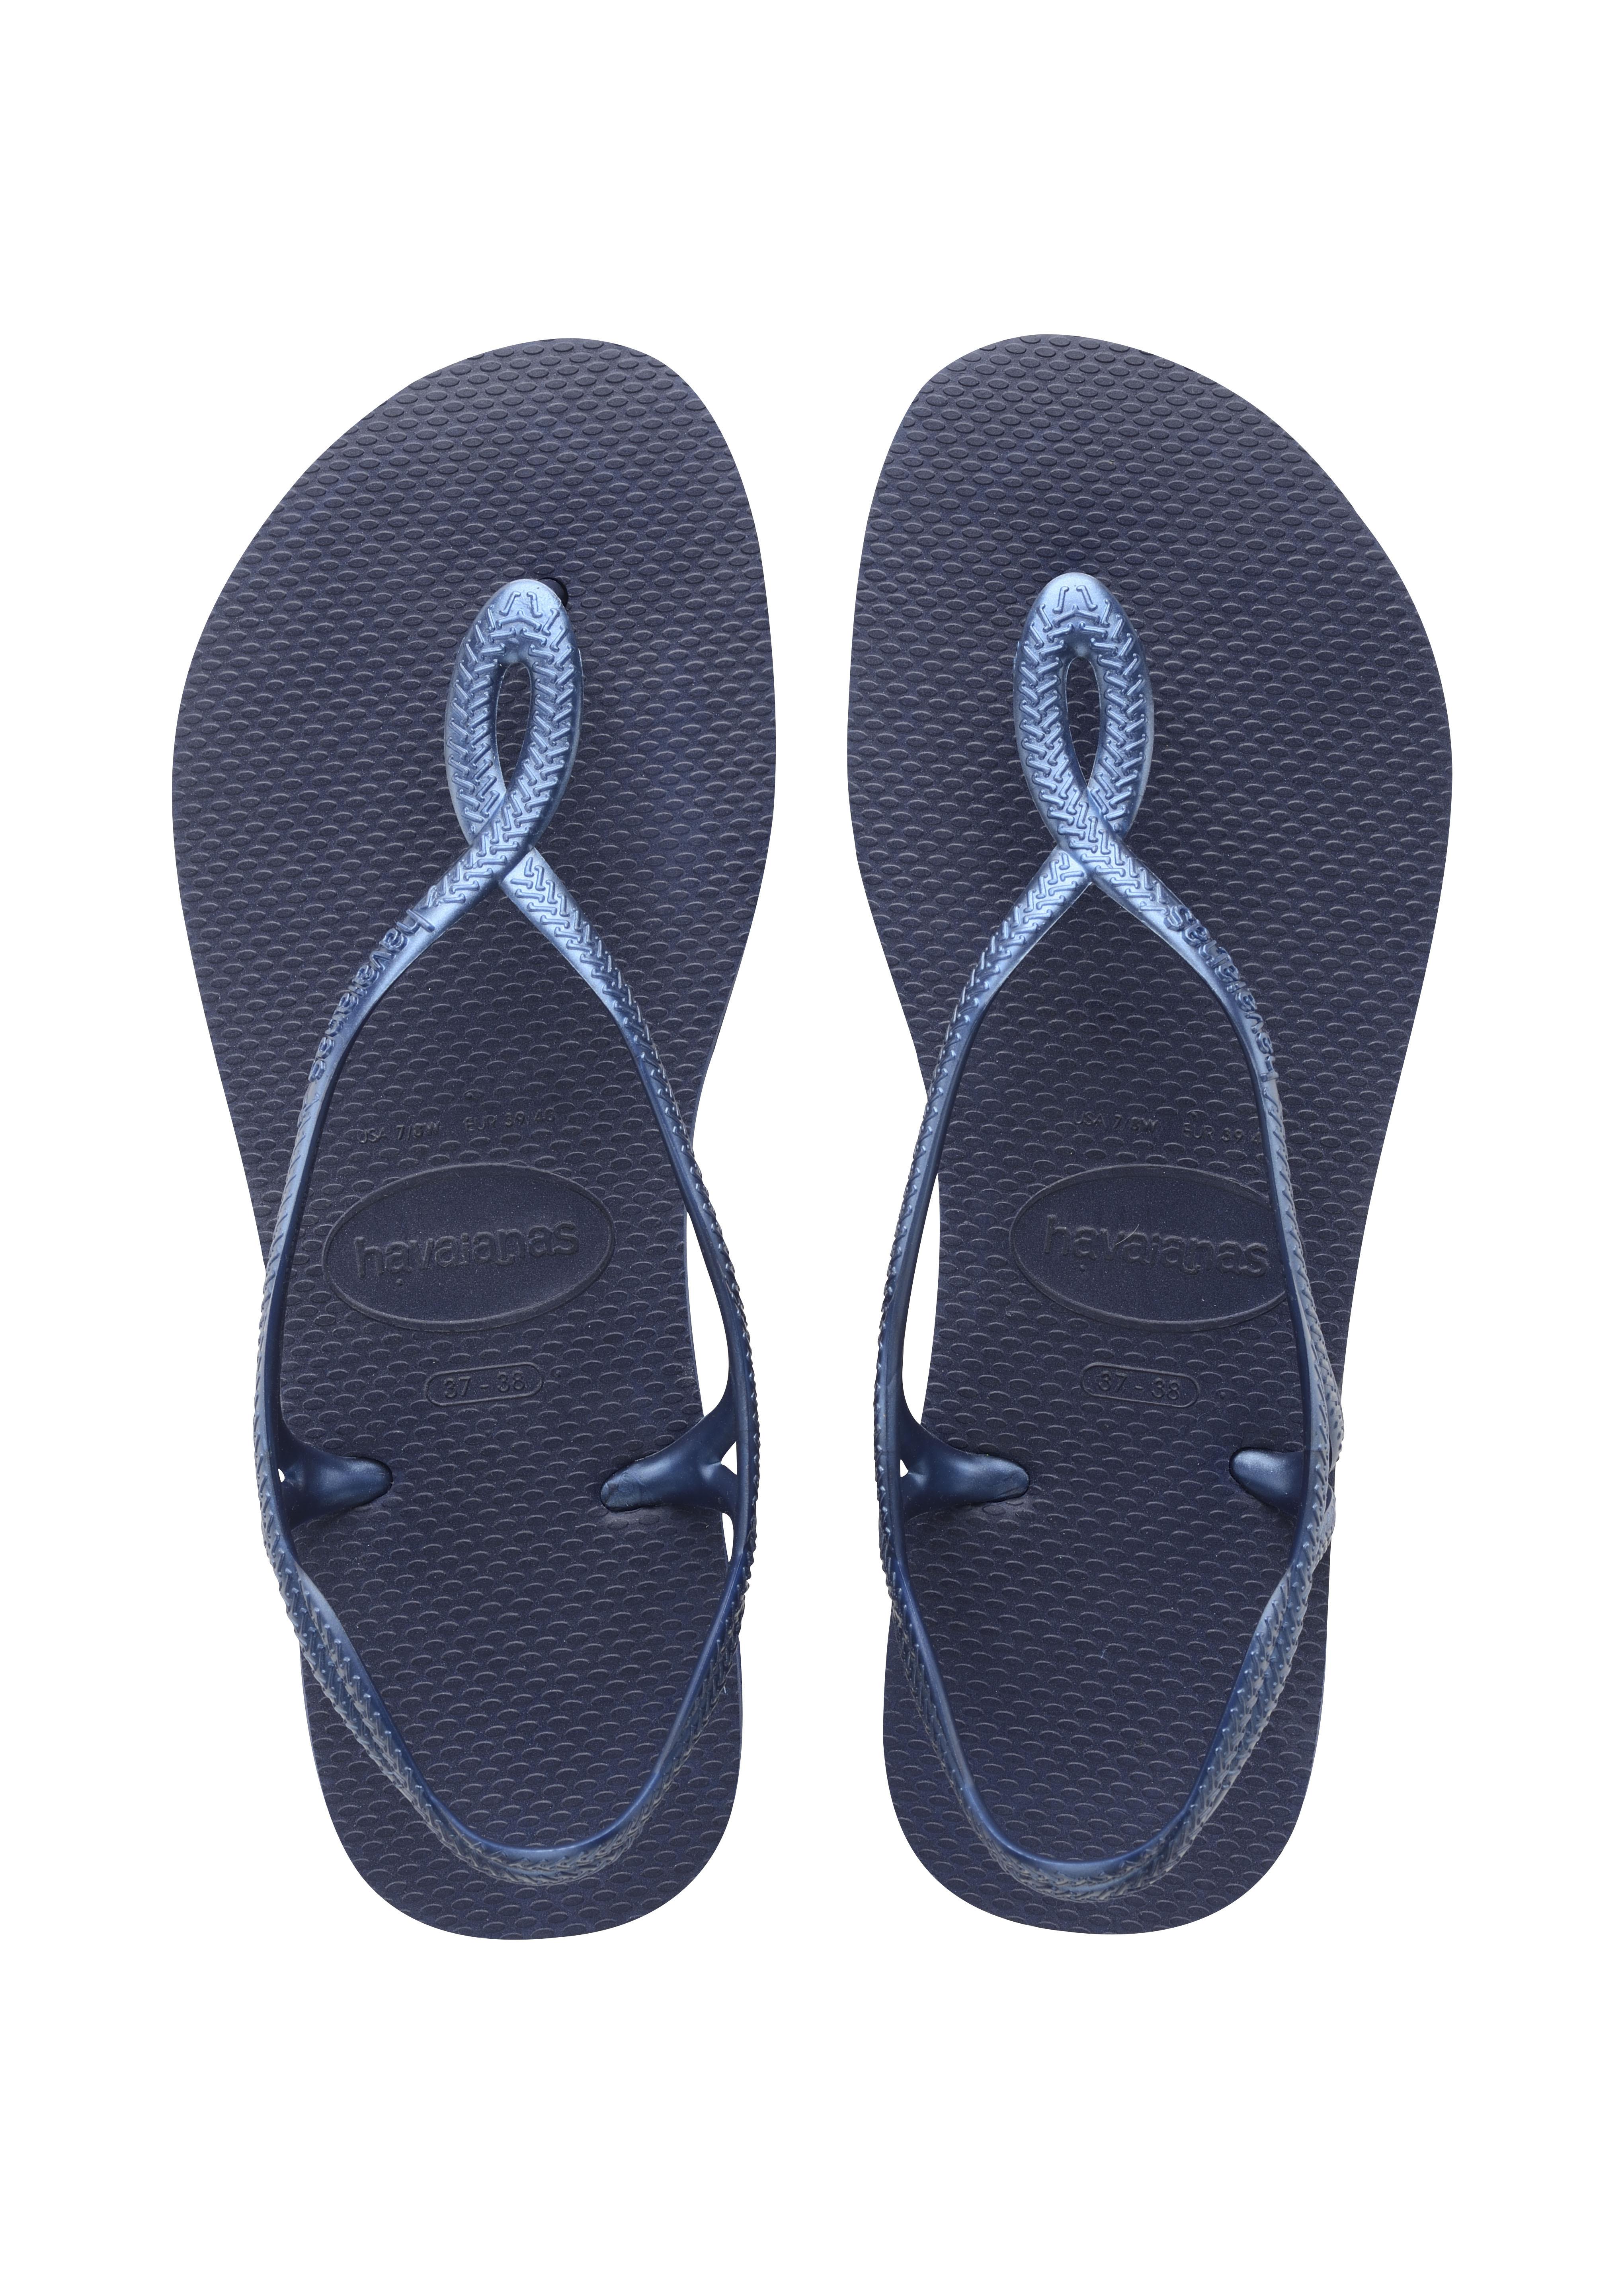 Sandales HAVAIANAS Luna bleu marine